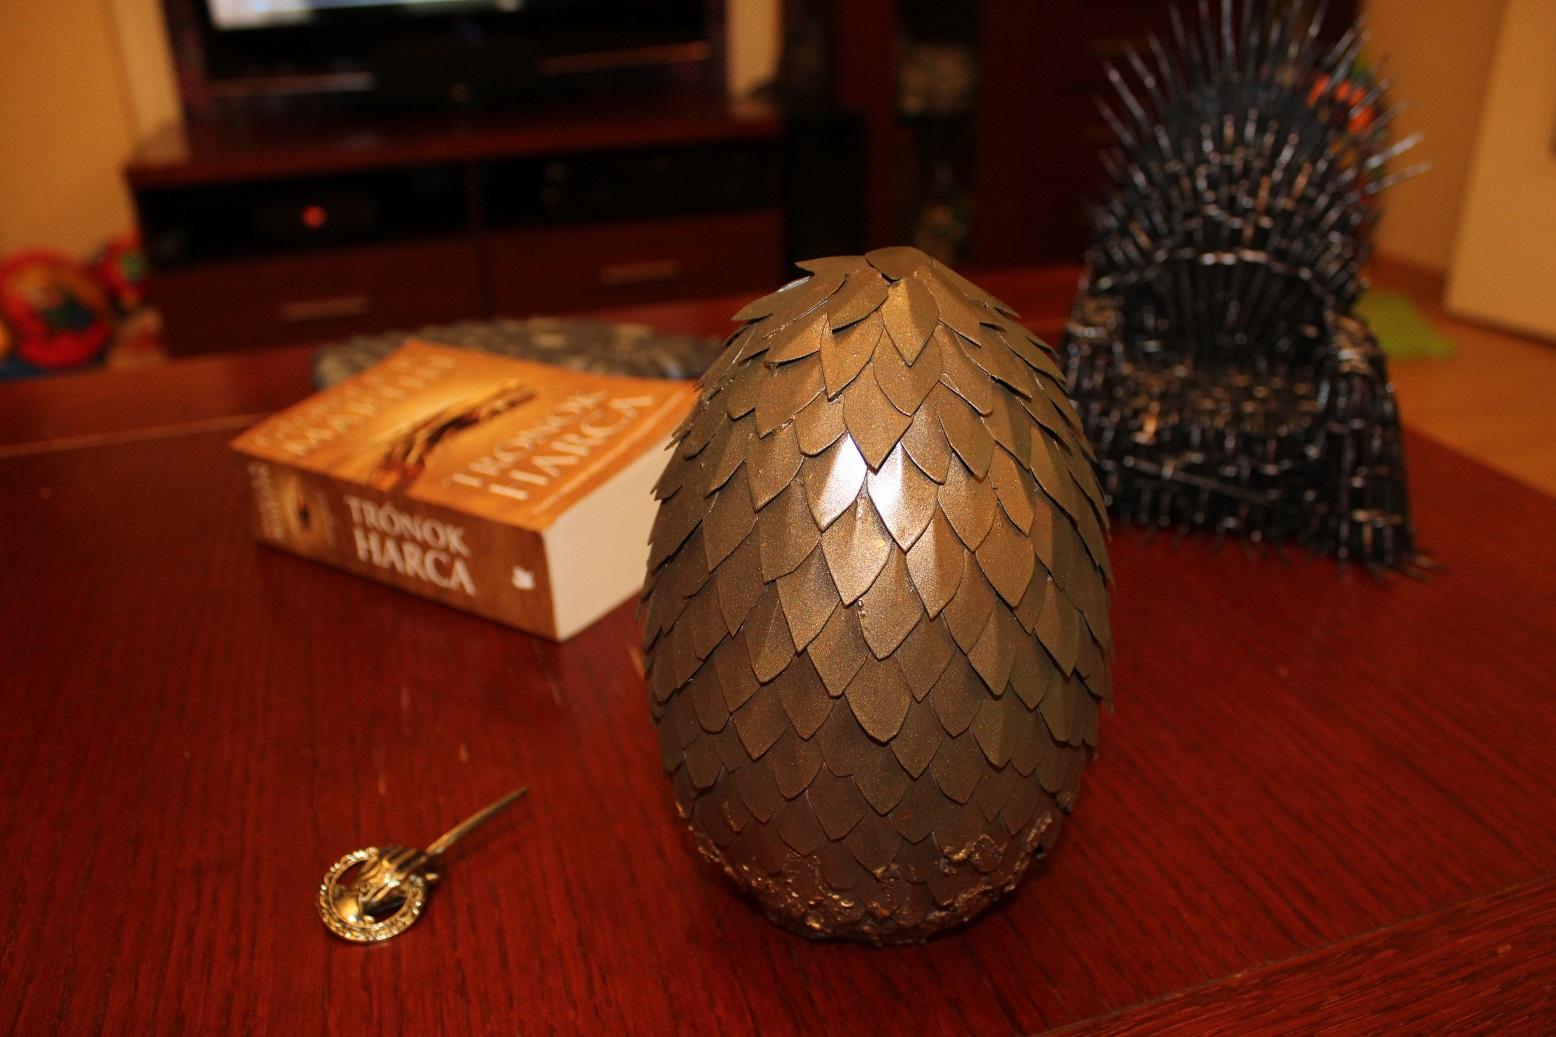 szmk_diy_tronok_harca_sarkanytojas_drogon_targaryen_danerys_dragonegg_game_of_thrones_hbo_winter_is_coming_westeros_csinald_magad_8.JPG